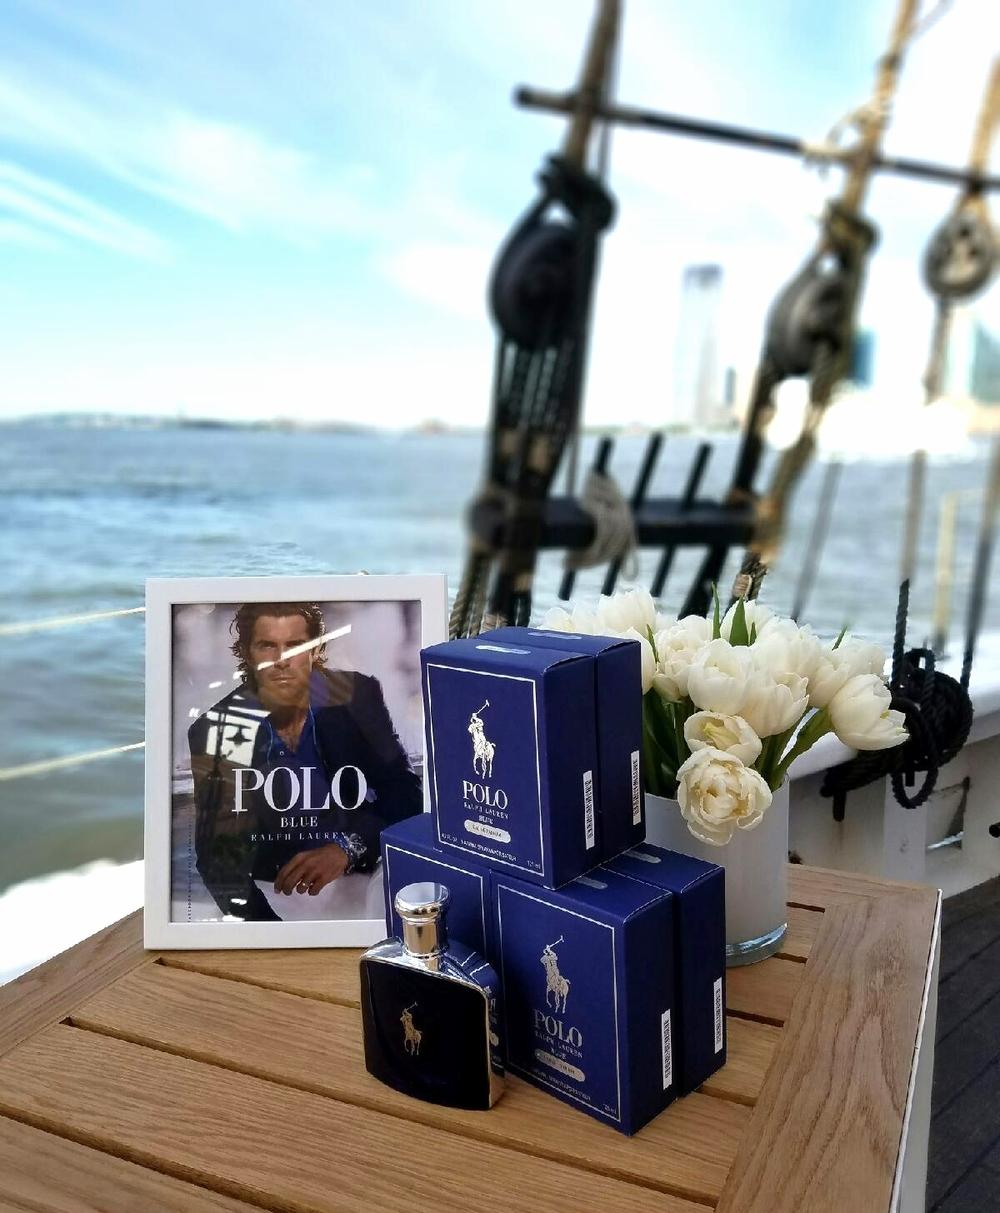 Polo Blue EDP Launch